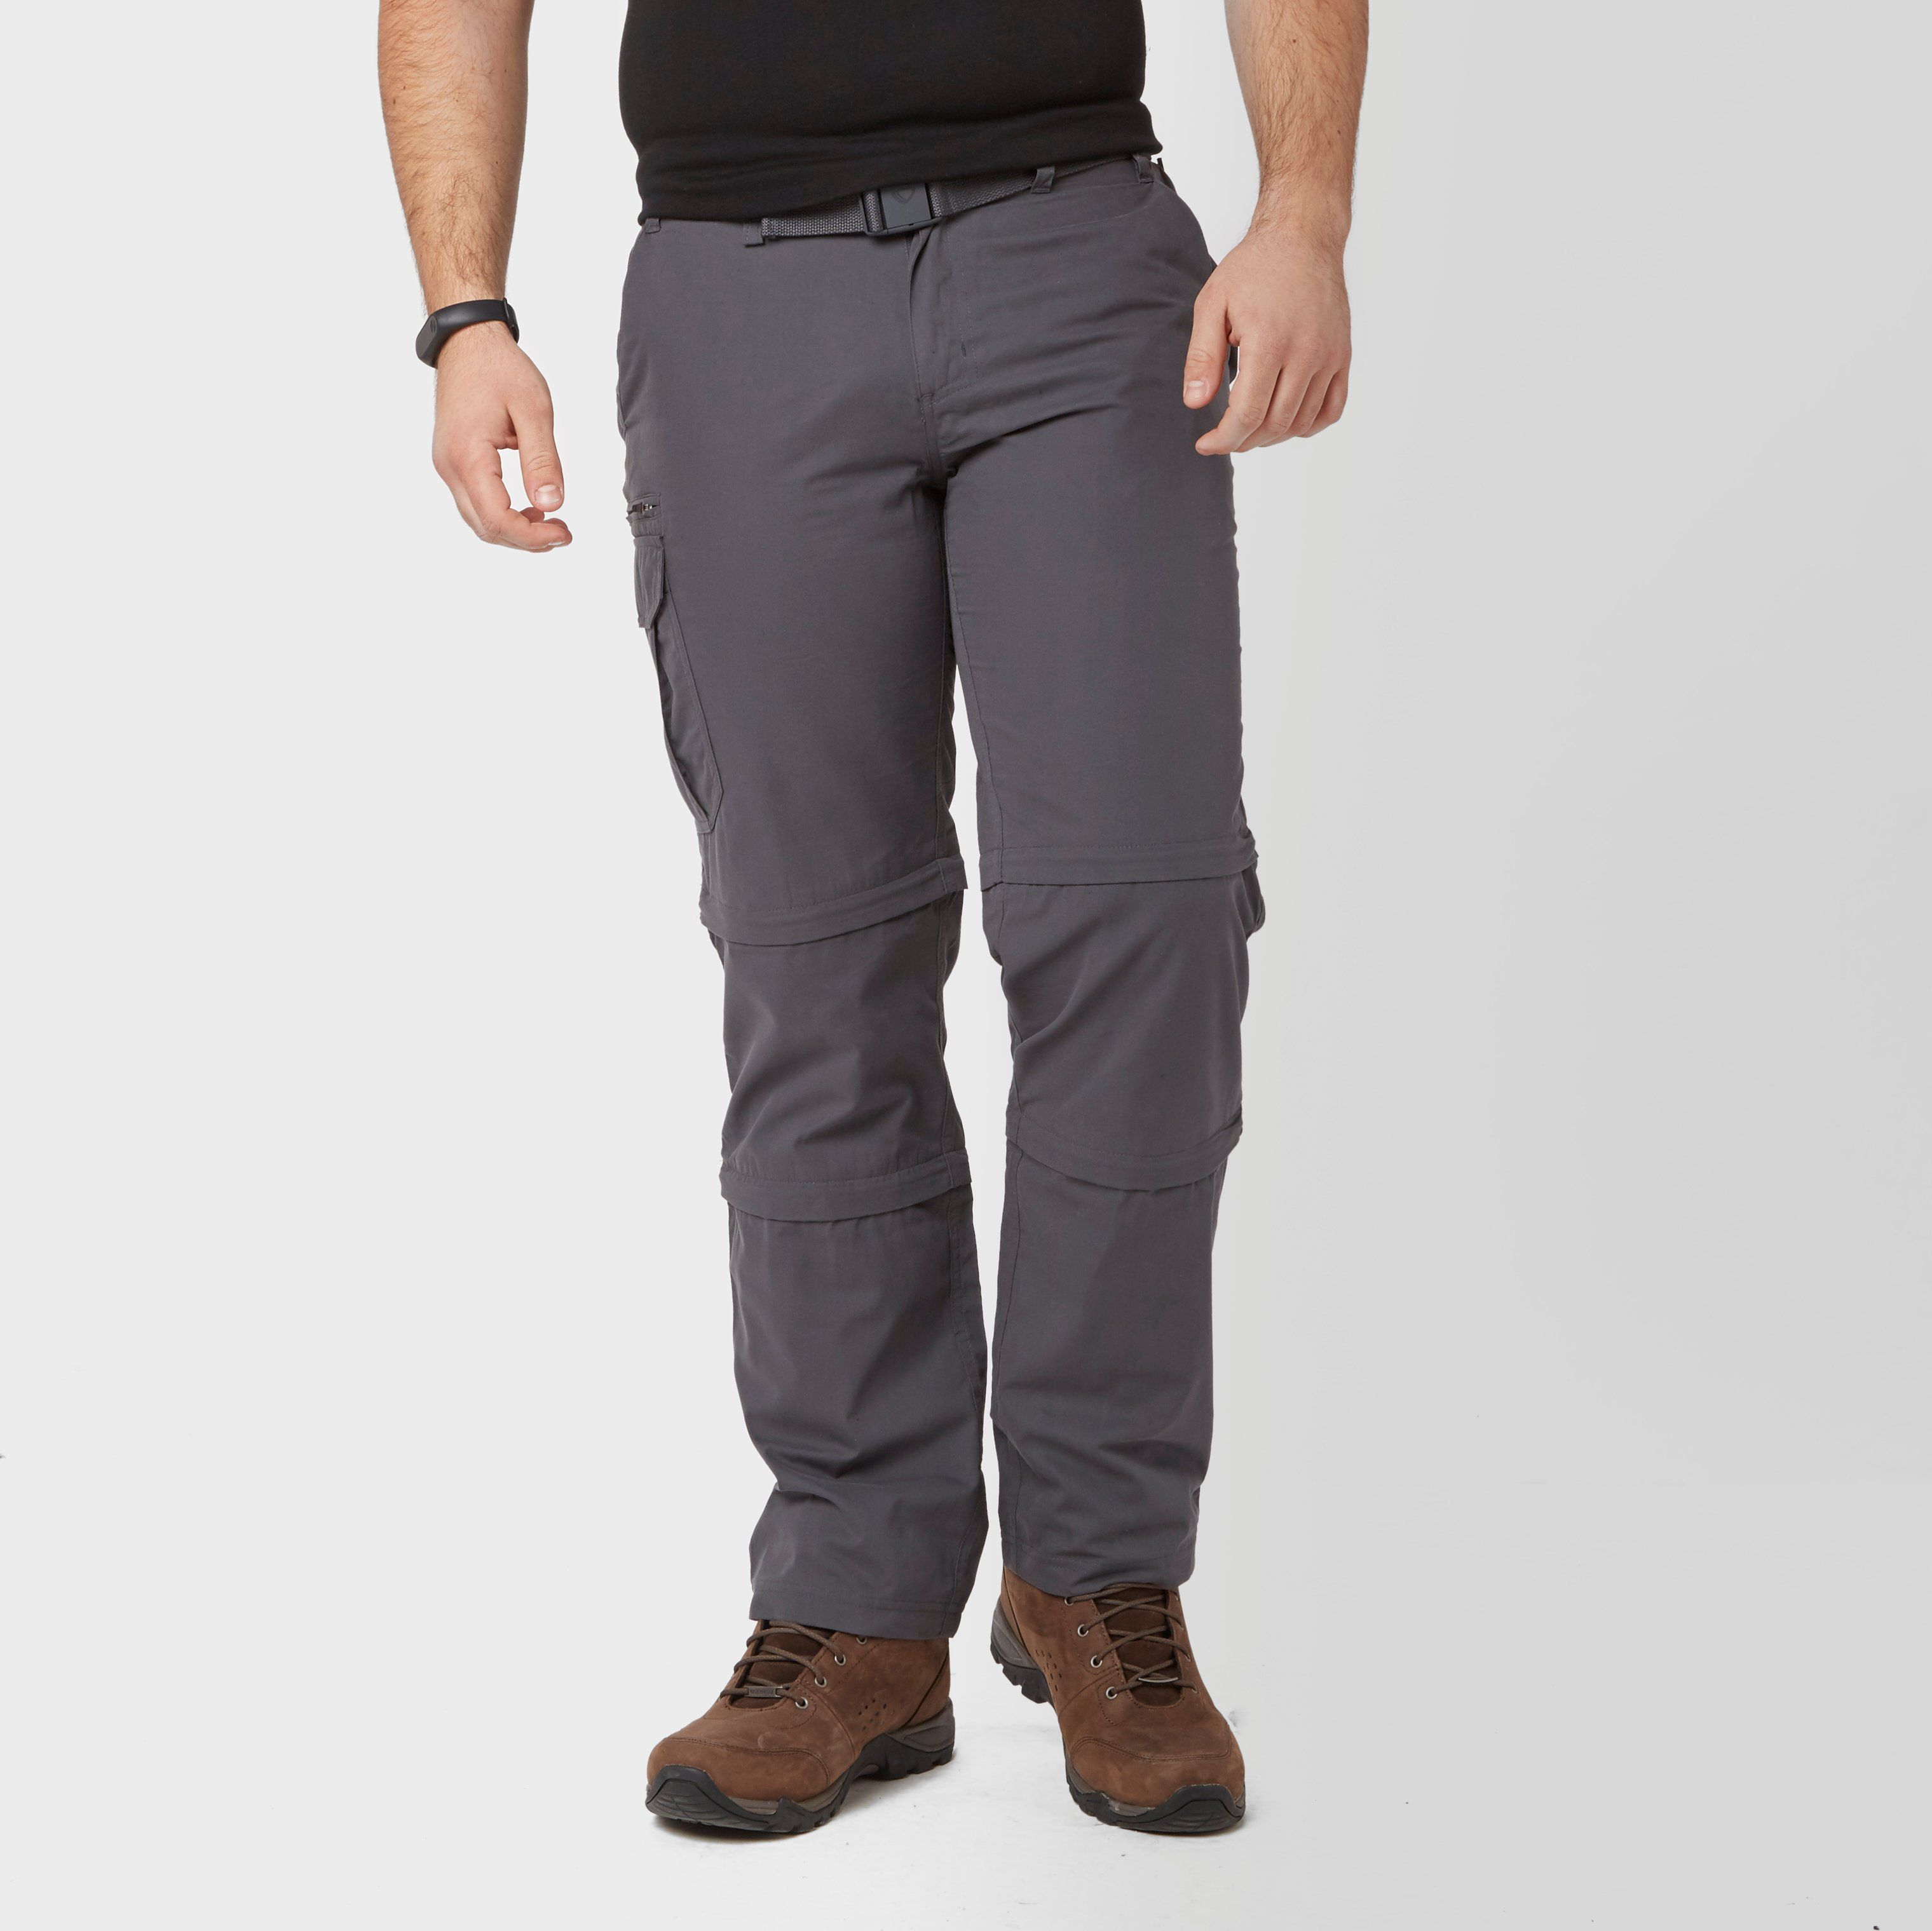 BRASHER Men's Double Zip-Off Trousers